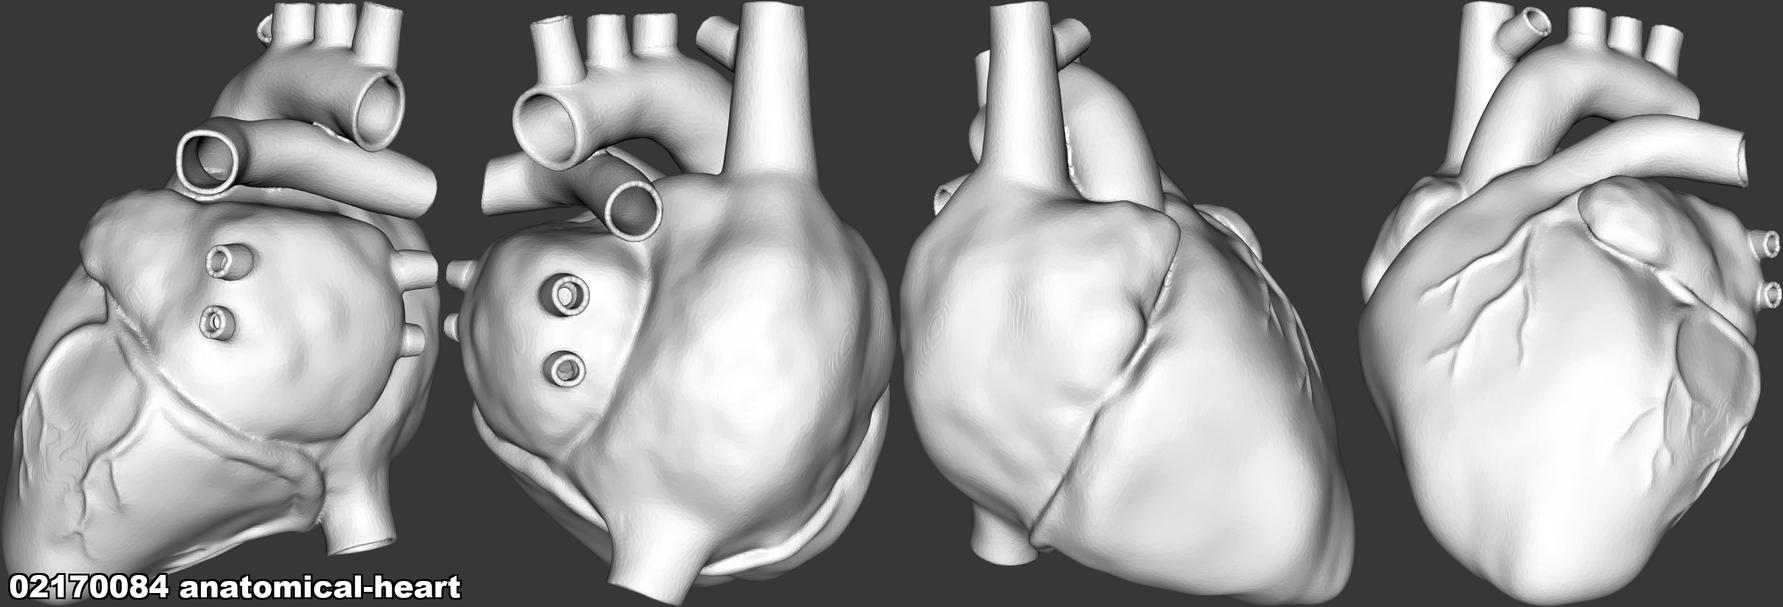 02170084 anatomical-heart.png